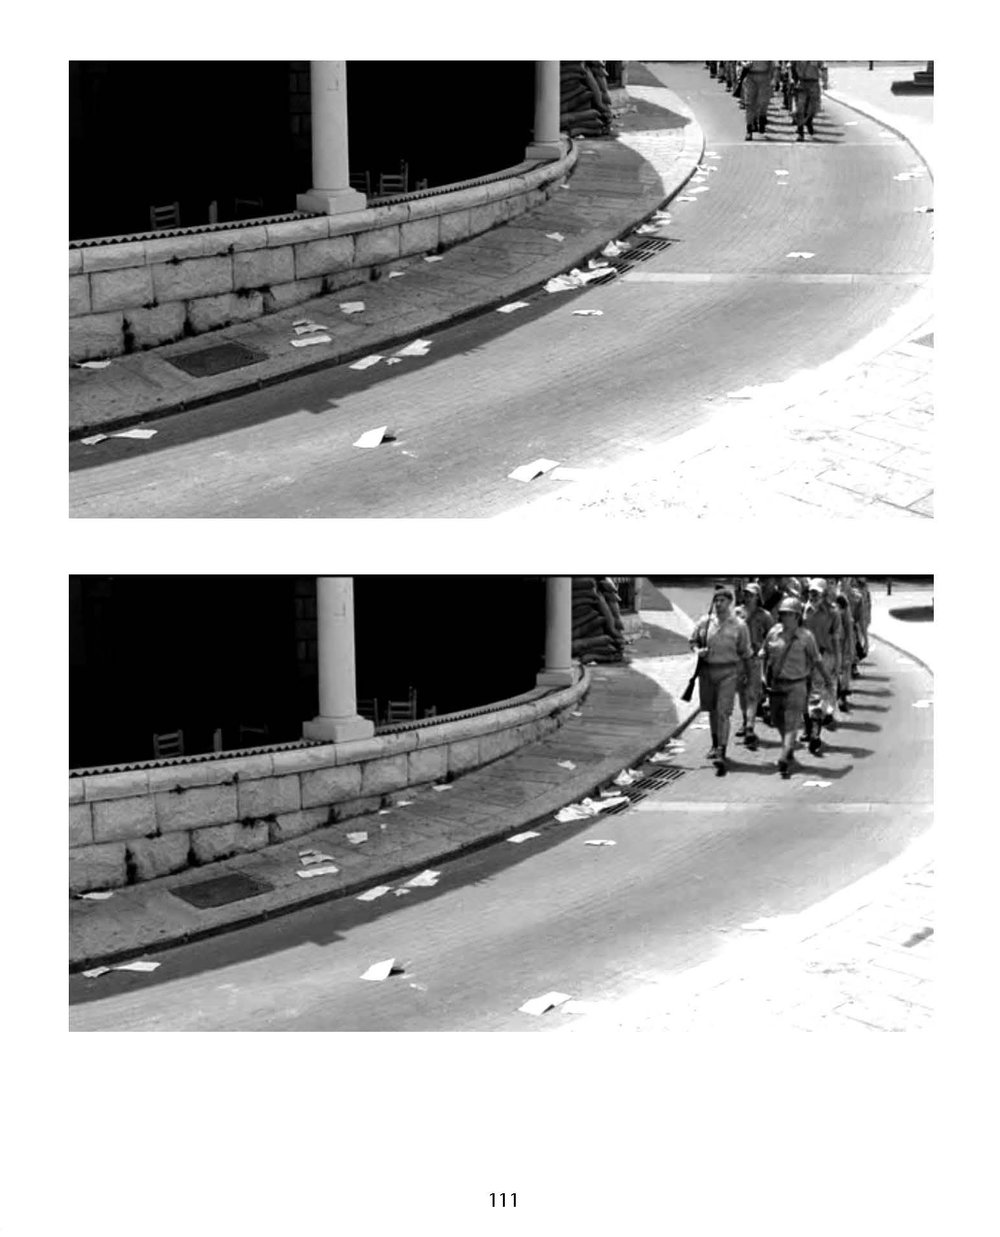 256_Final_Page_111.jpg